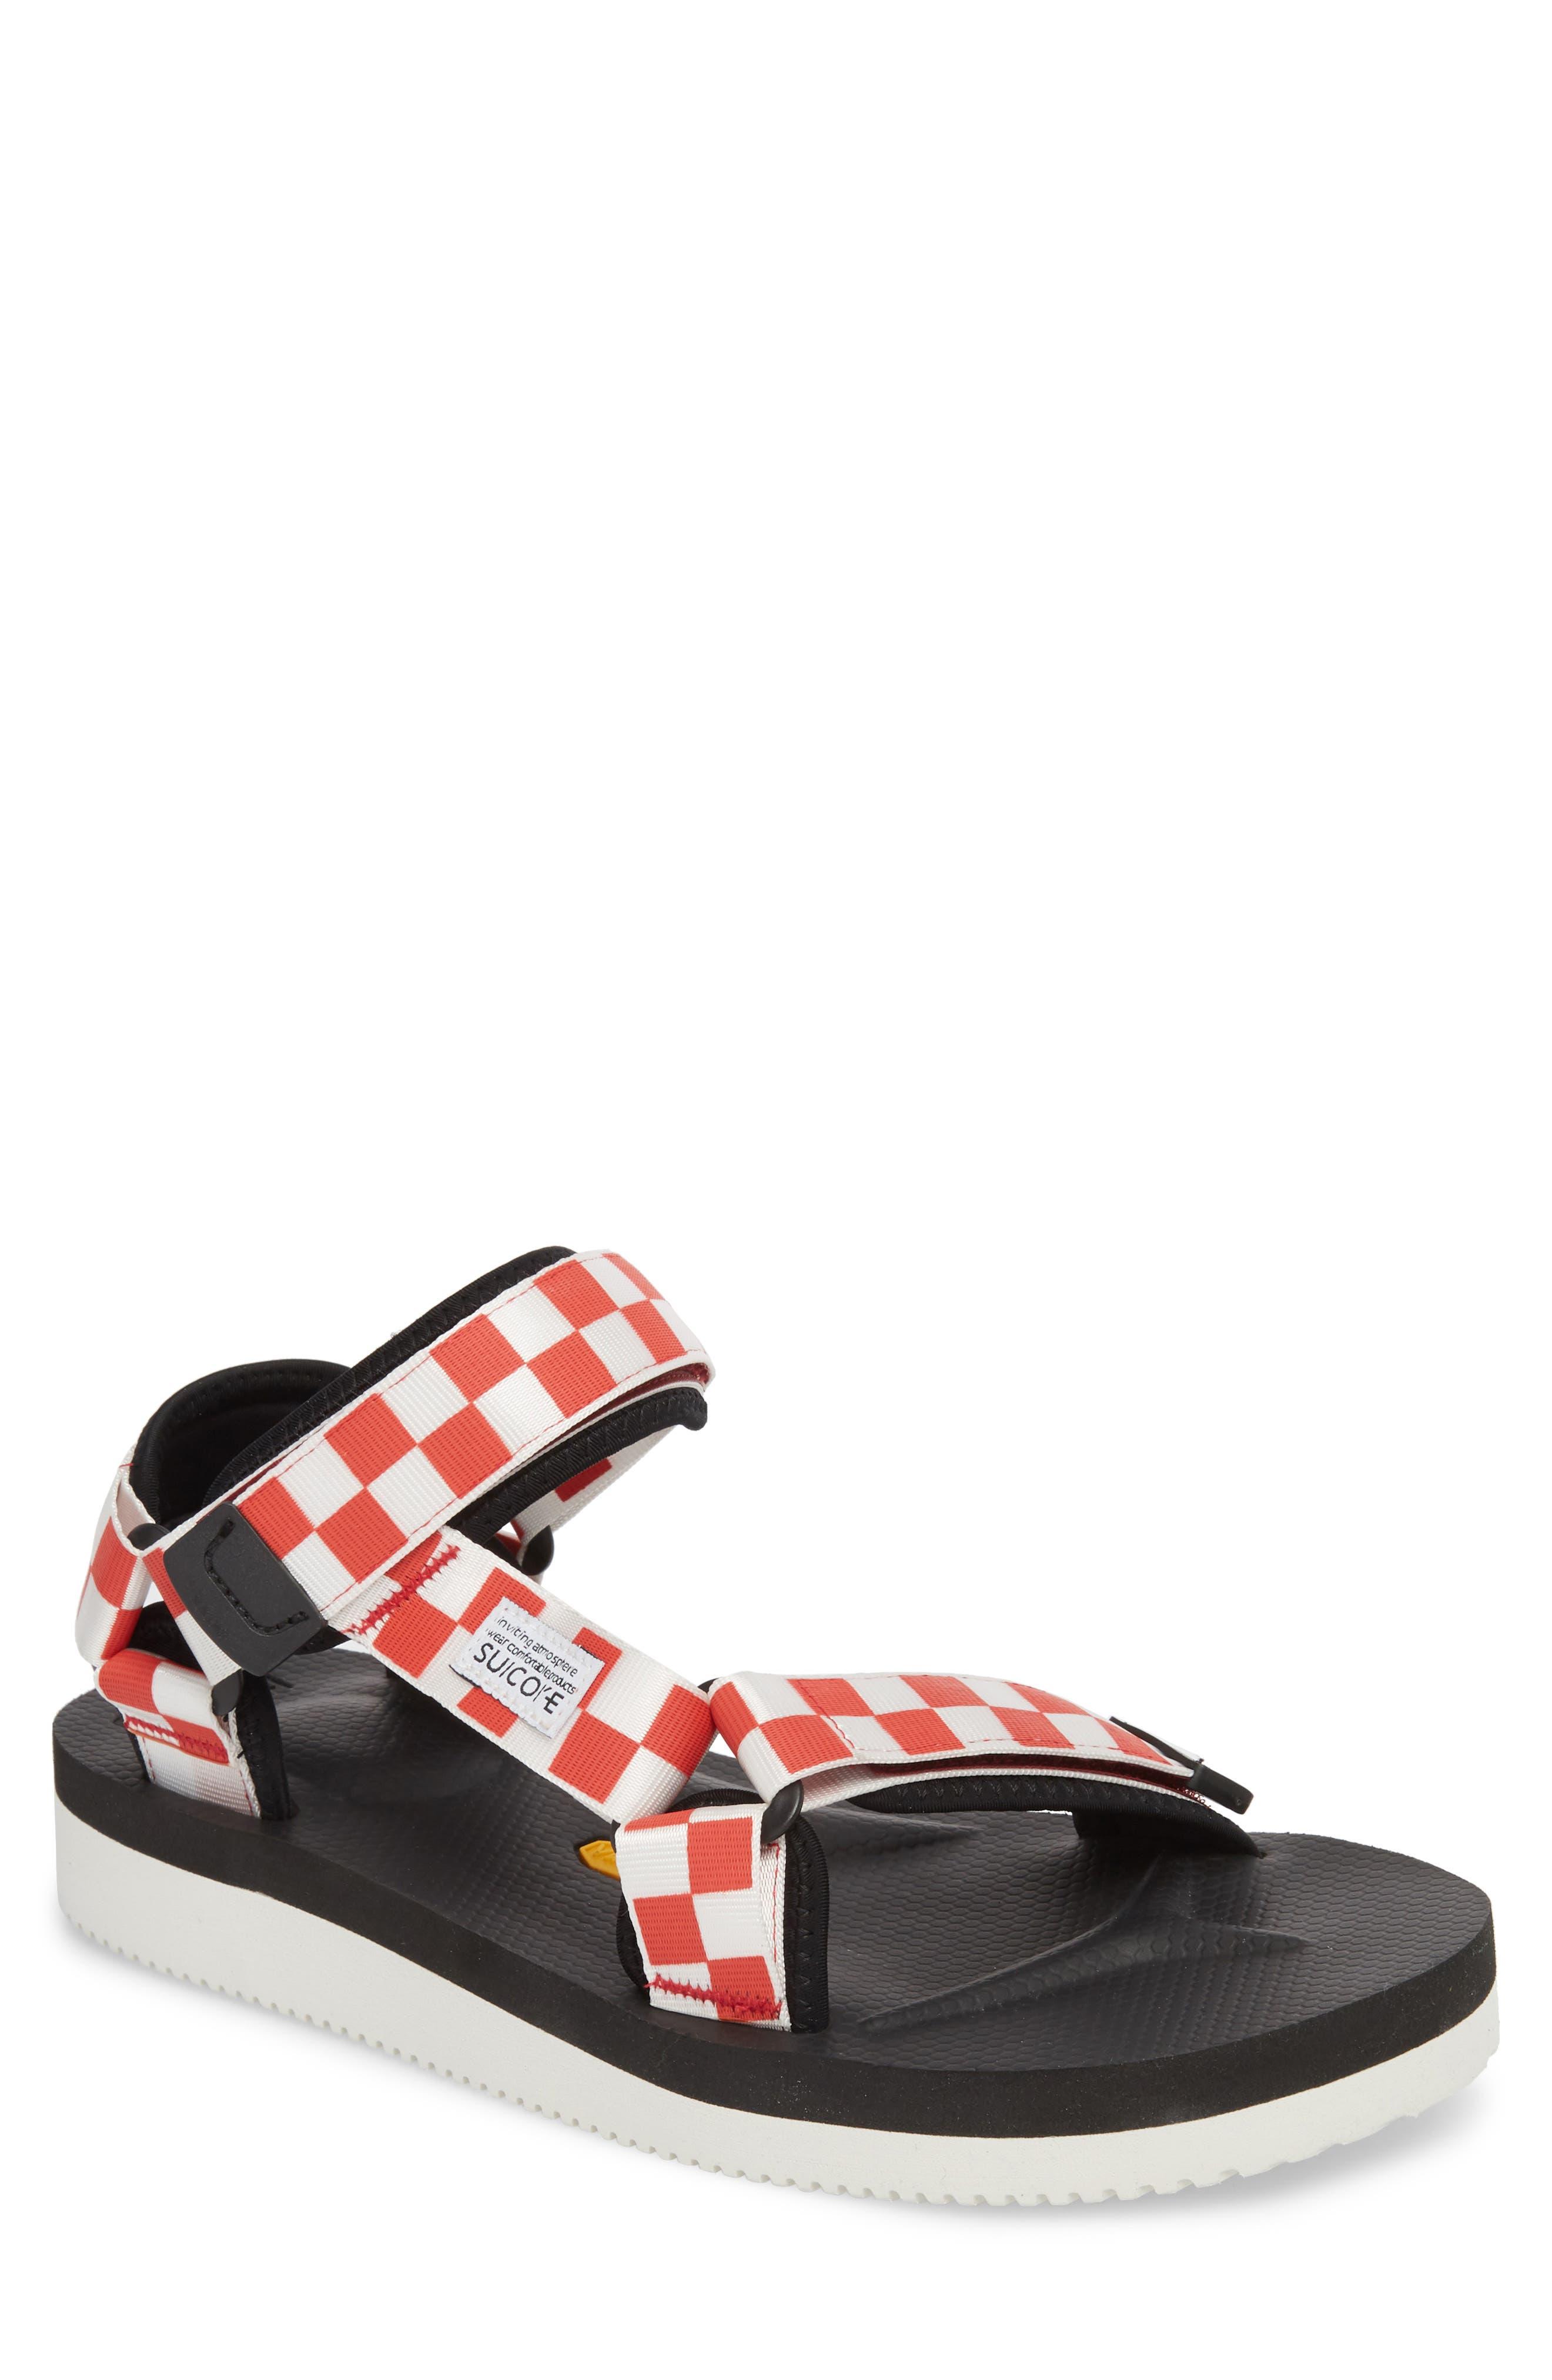 Depa Sport Sandal,                         Main,                         color, RED